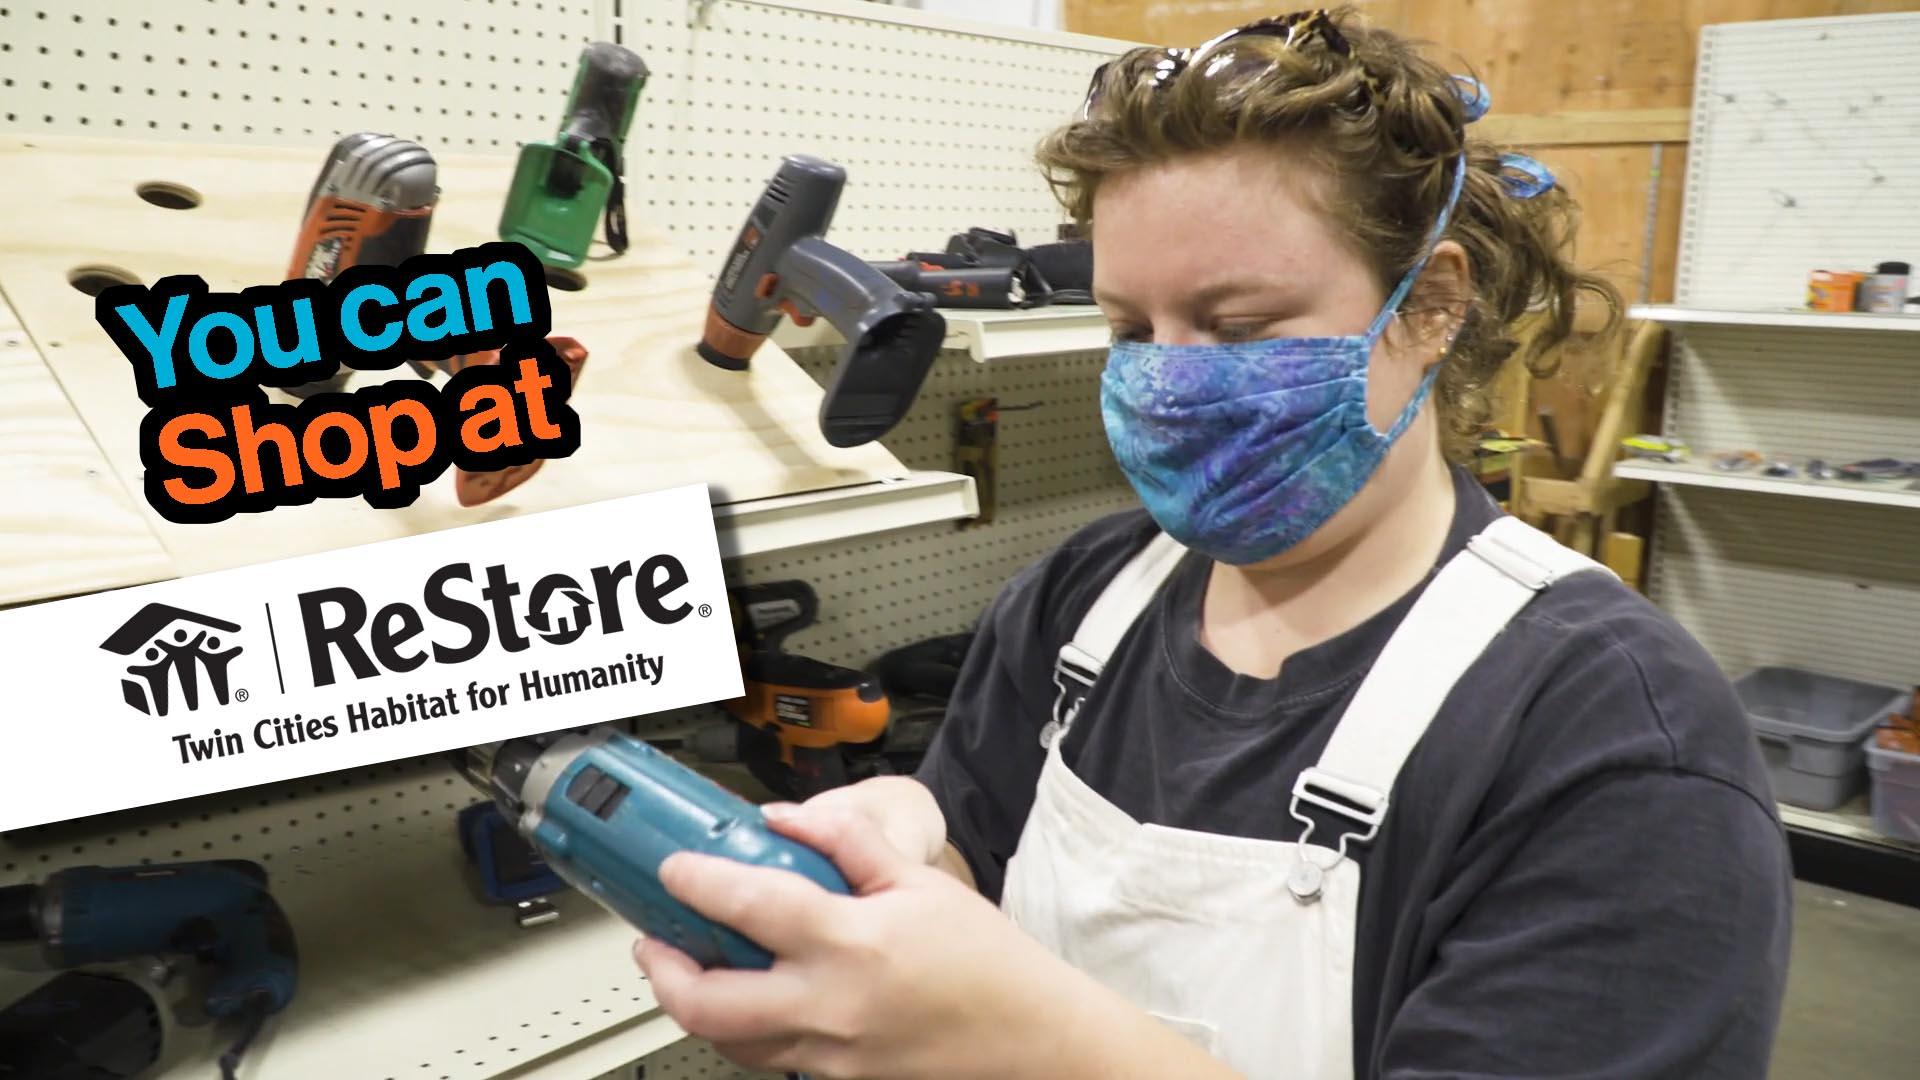 Shop at ReStore safely